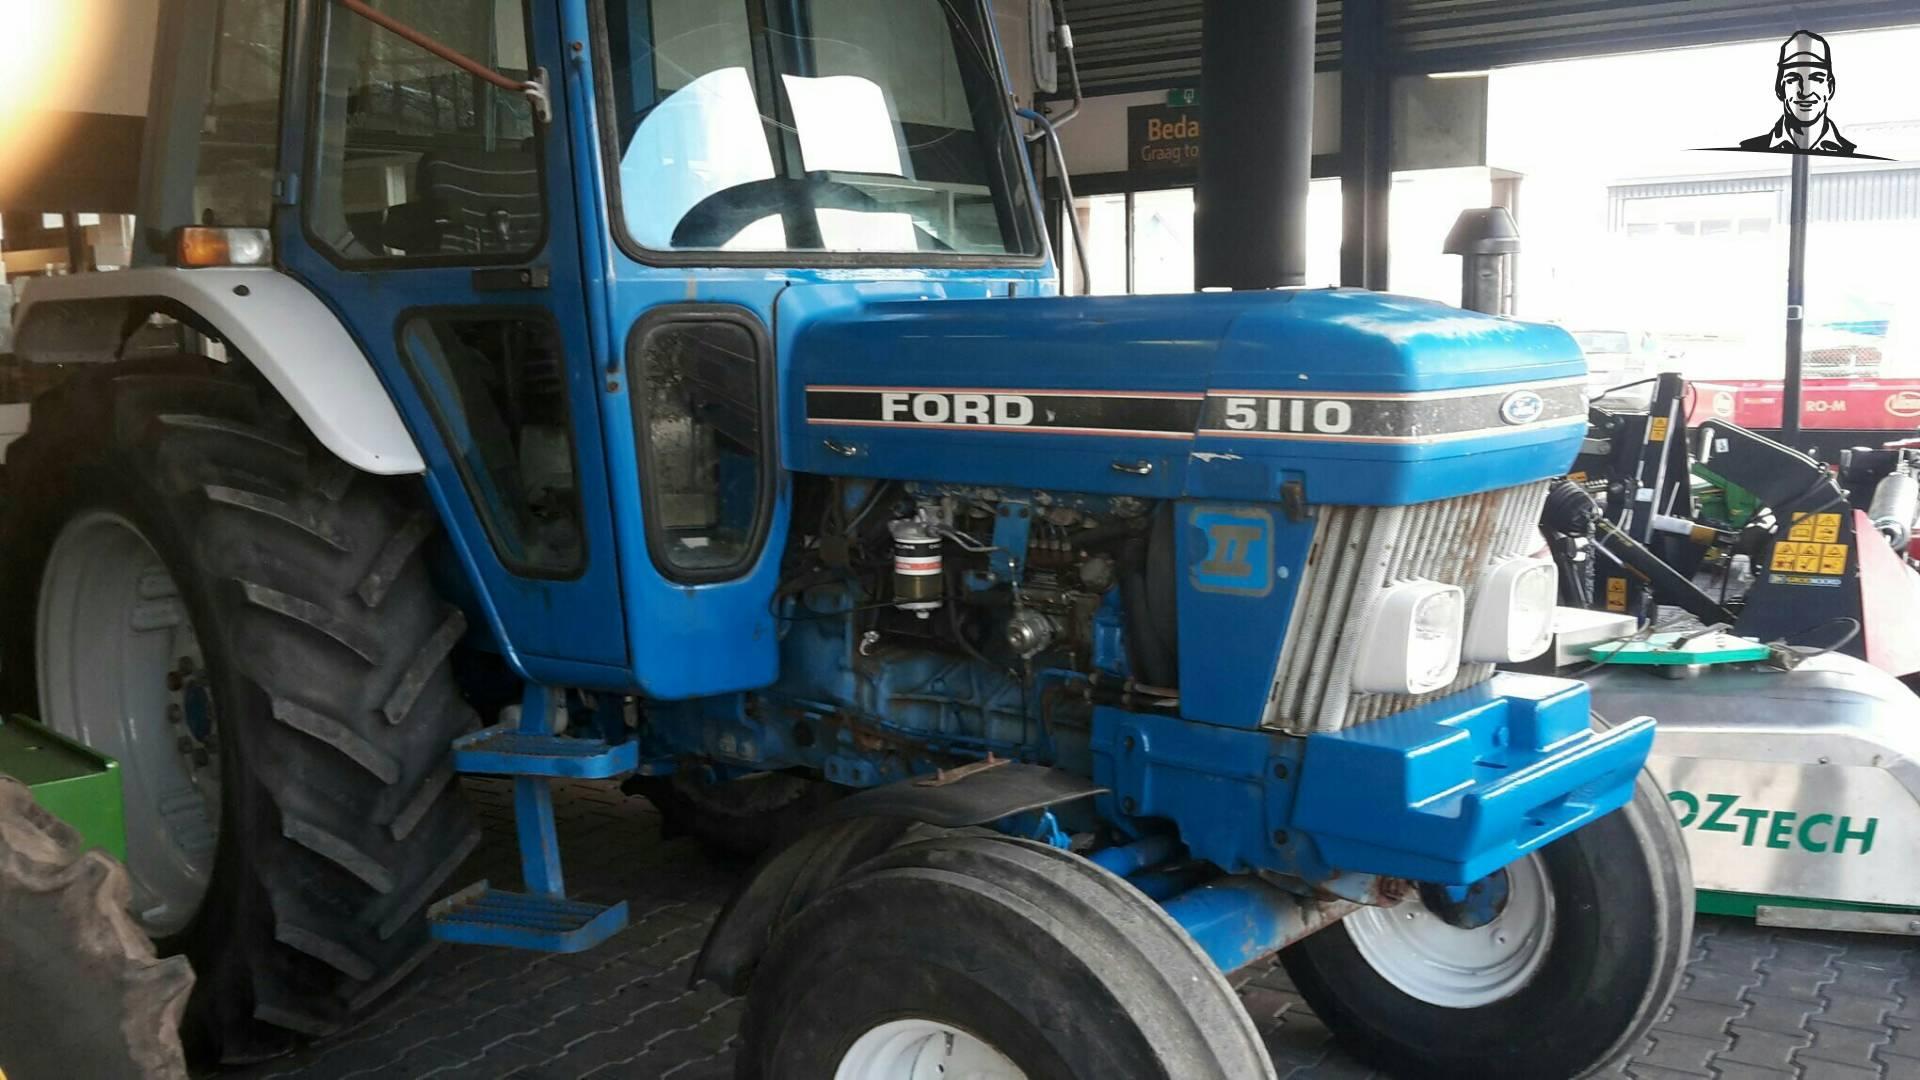 Ford 5110 voor Veegservice Hoogeveen van Sylke